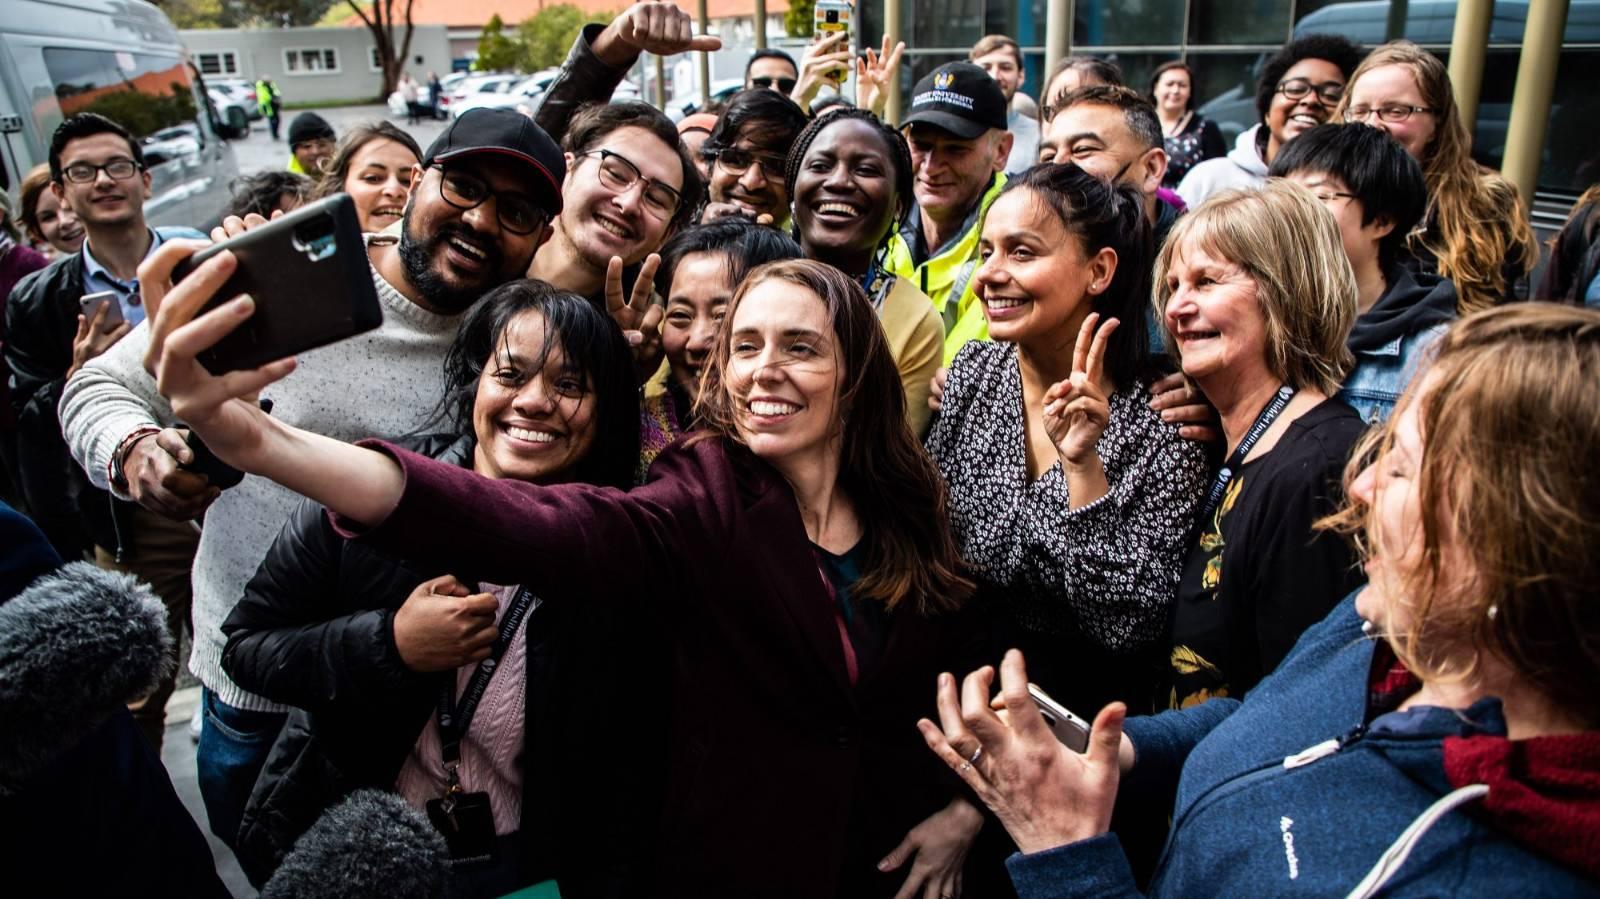 PM admits crowded selfie was a mistake